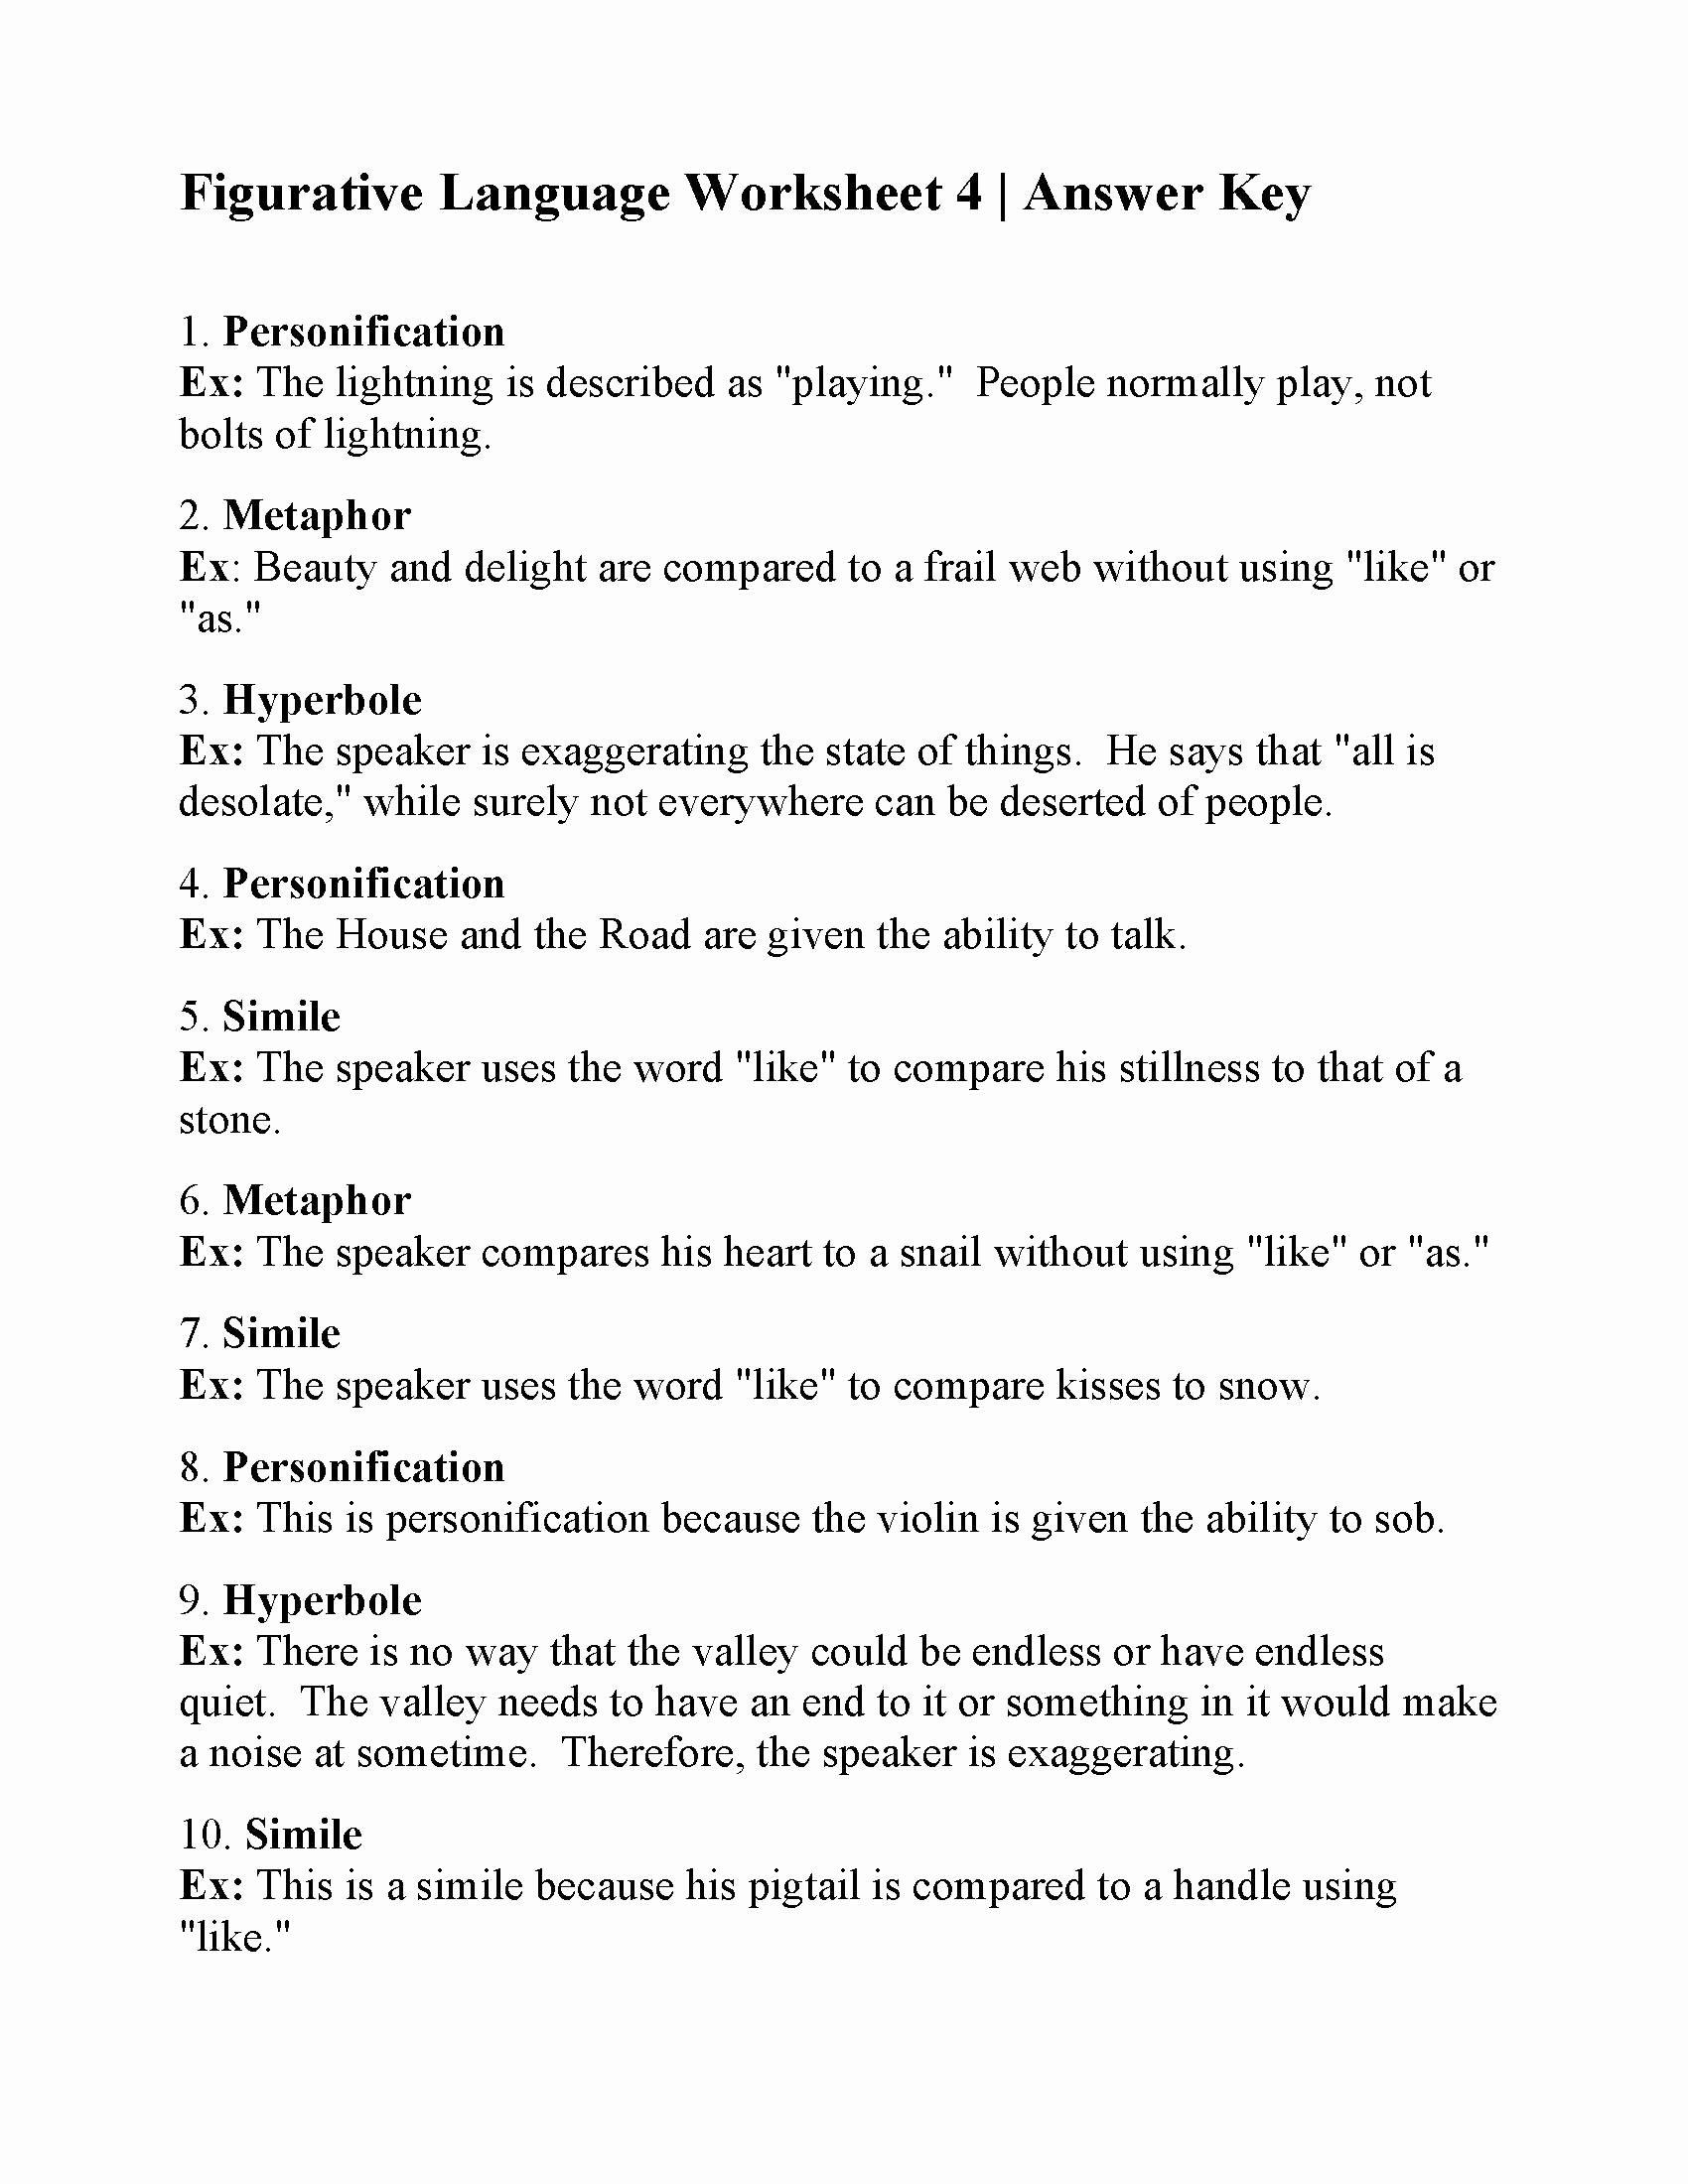 Figurative Language Worksheets 6th Grade Fresh 6th Grade Practice Test 2 Digit Times 2 Digit Worksheets